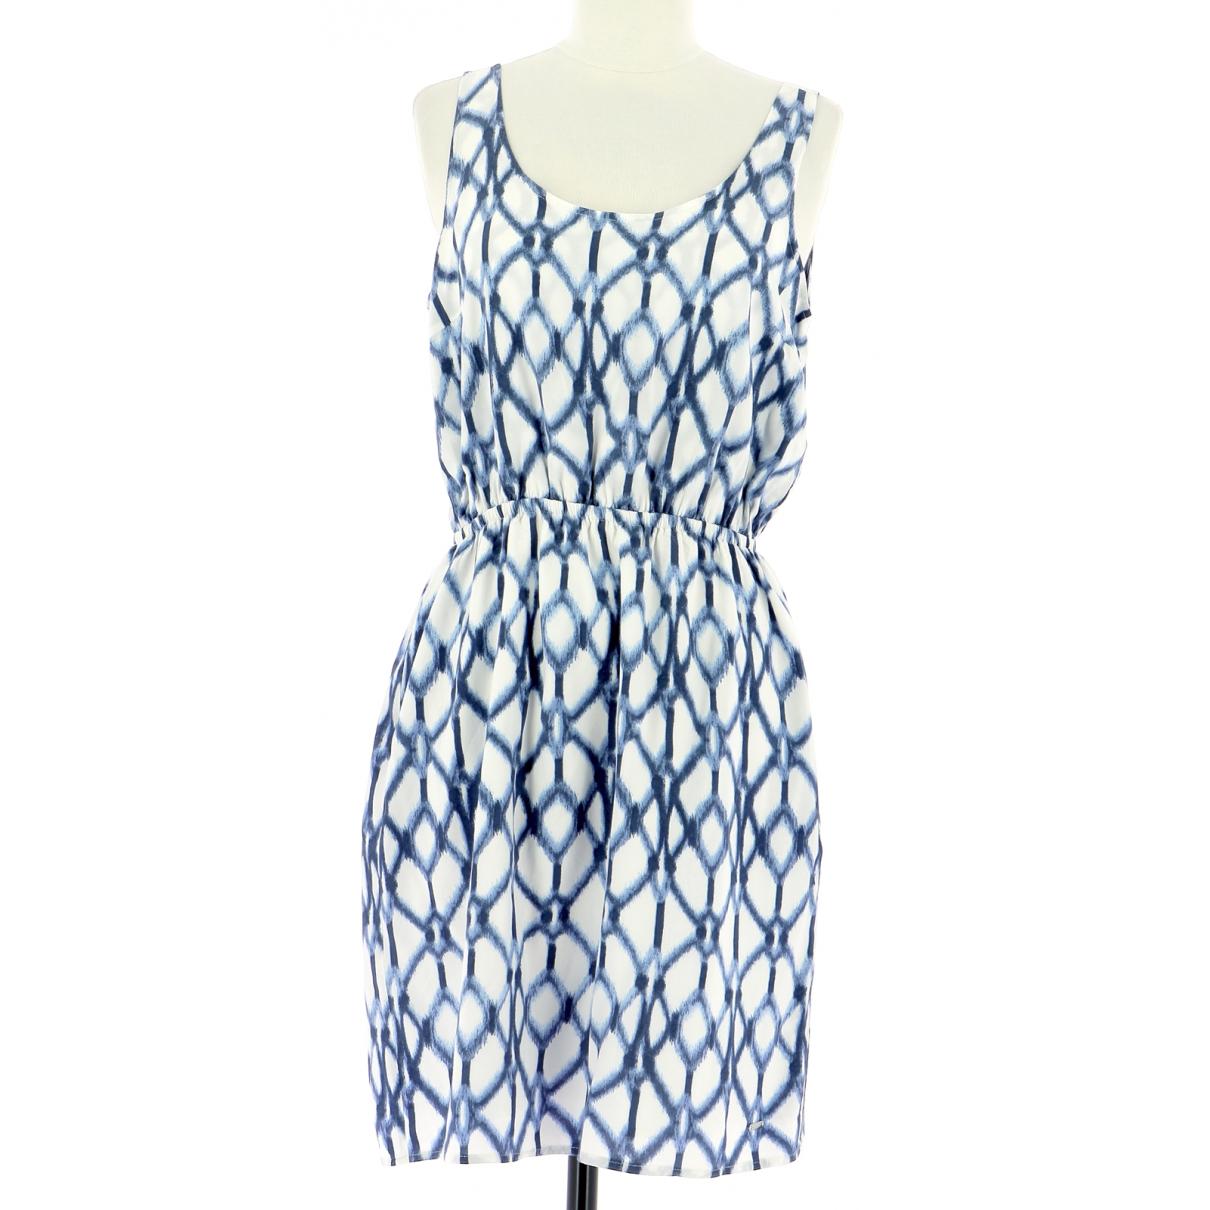 Tommy Hilfiger \N White dress for Women 38 FR